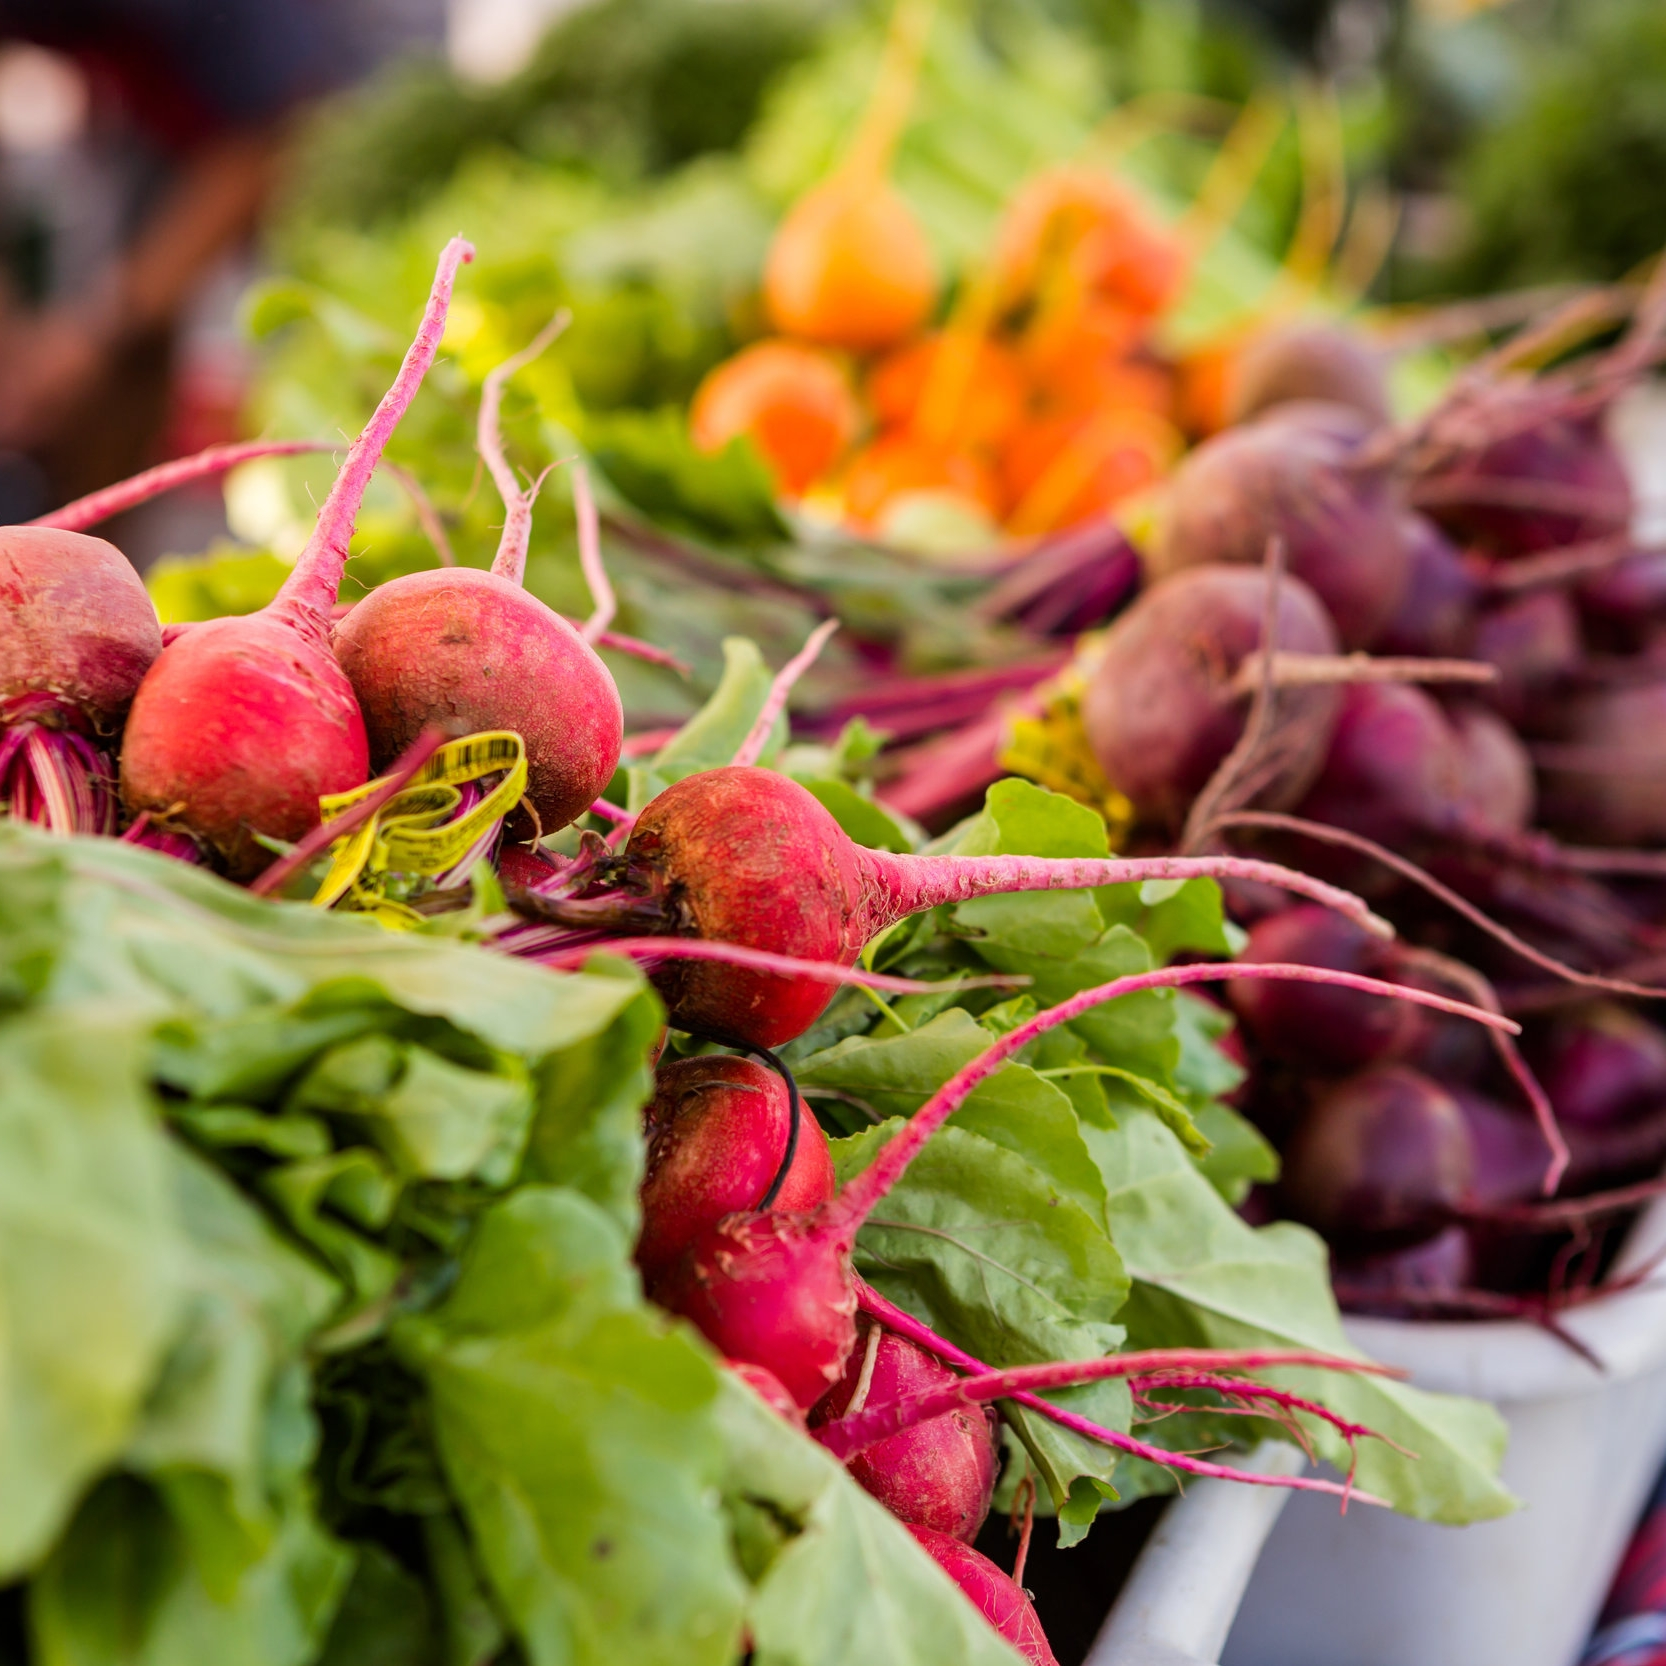 farmers market produce.jpg